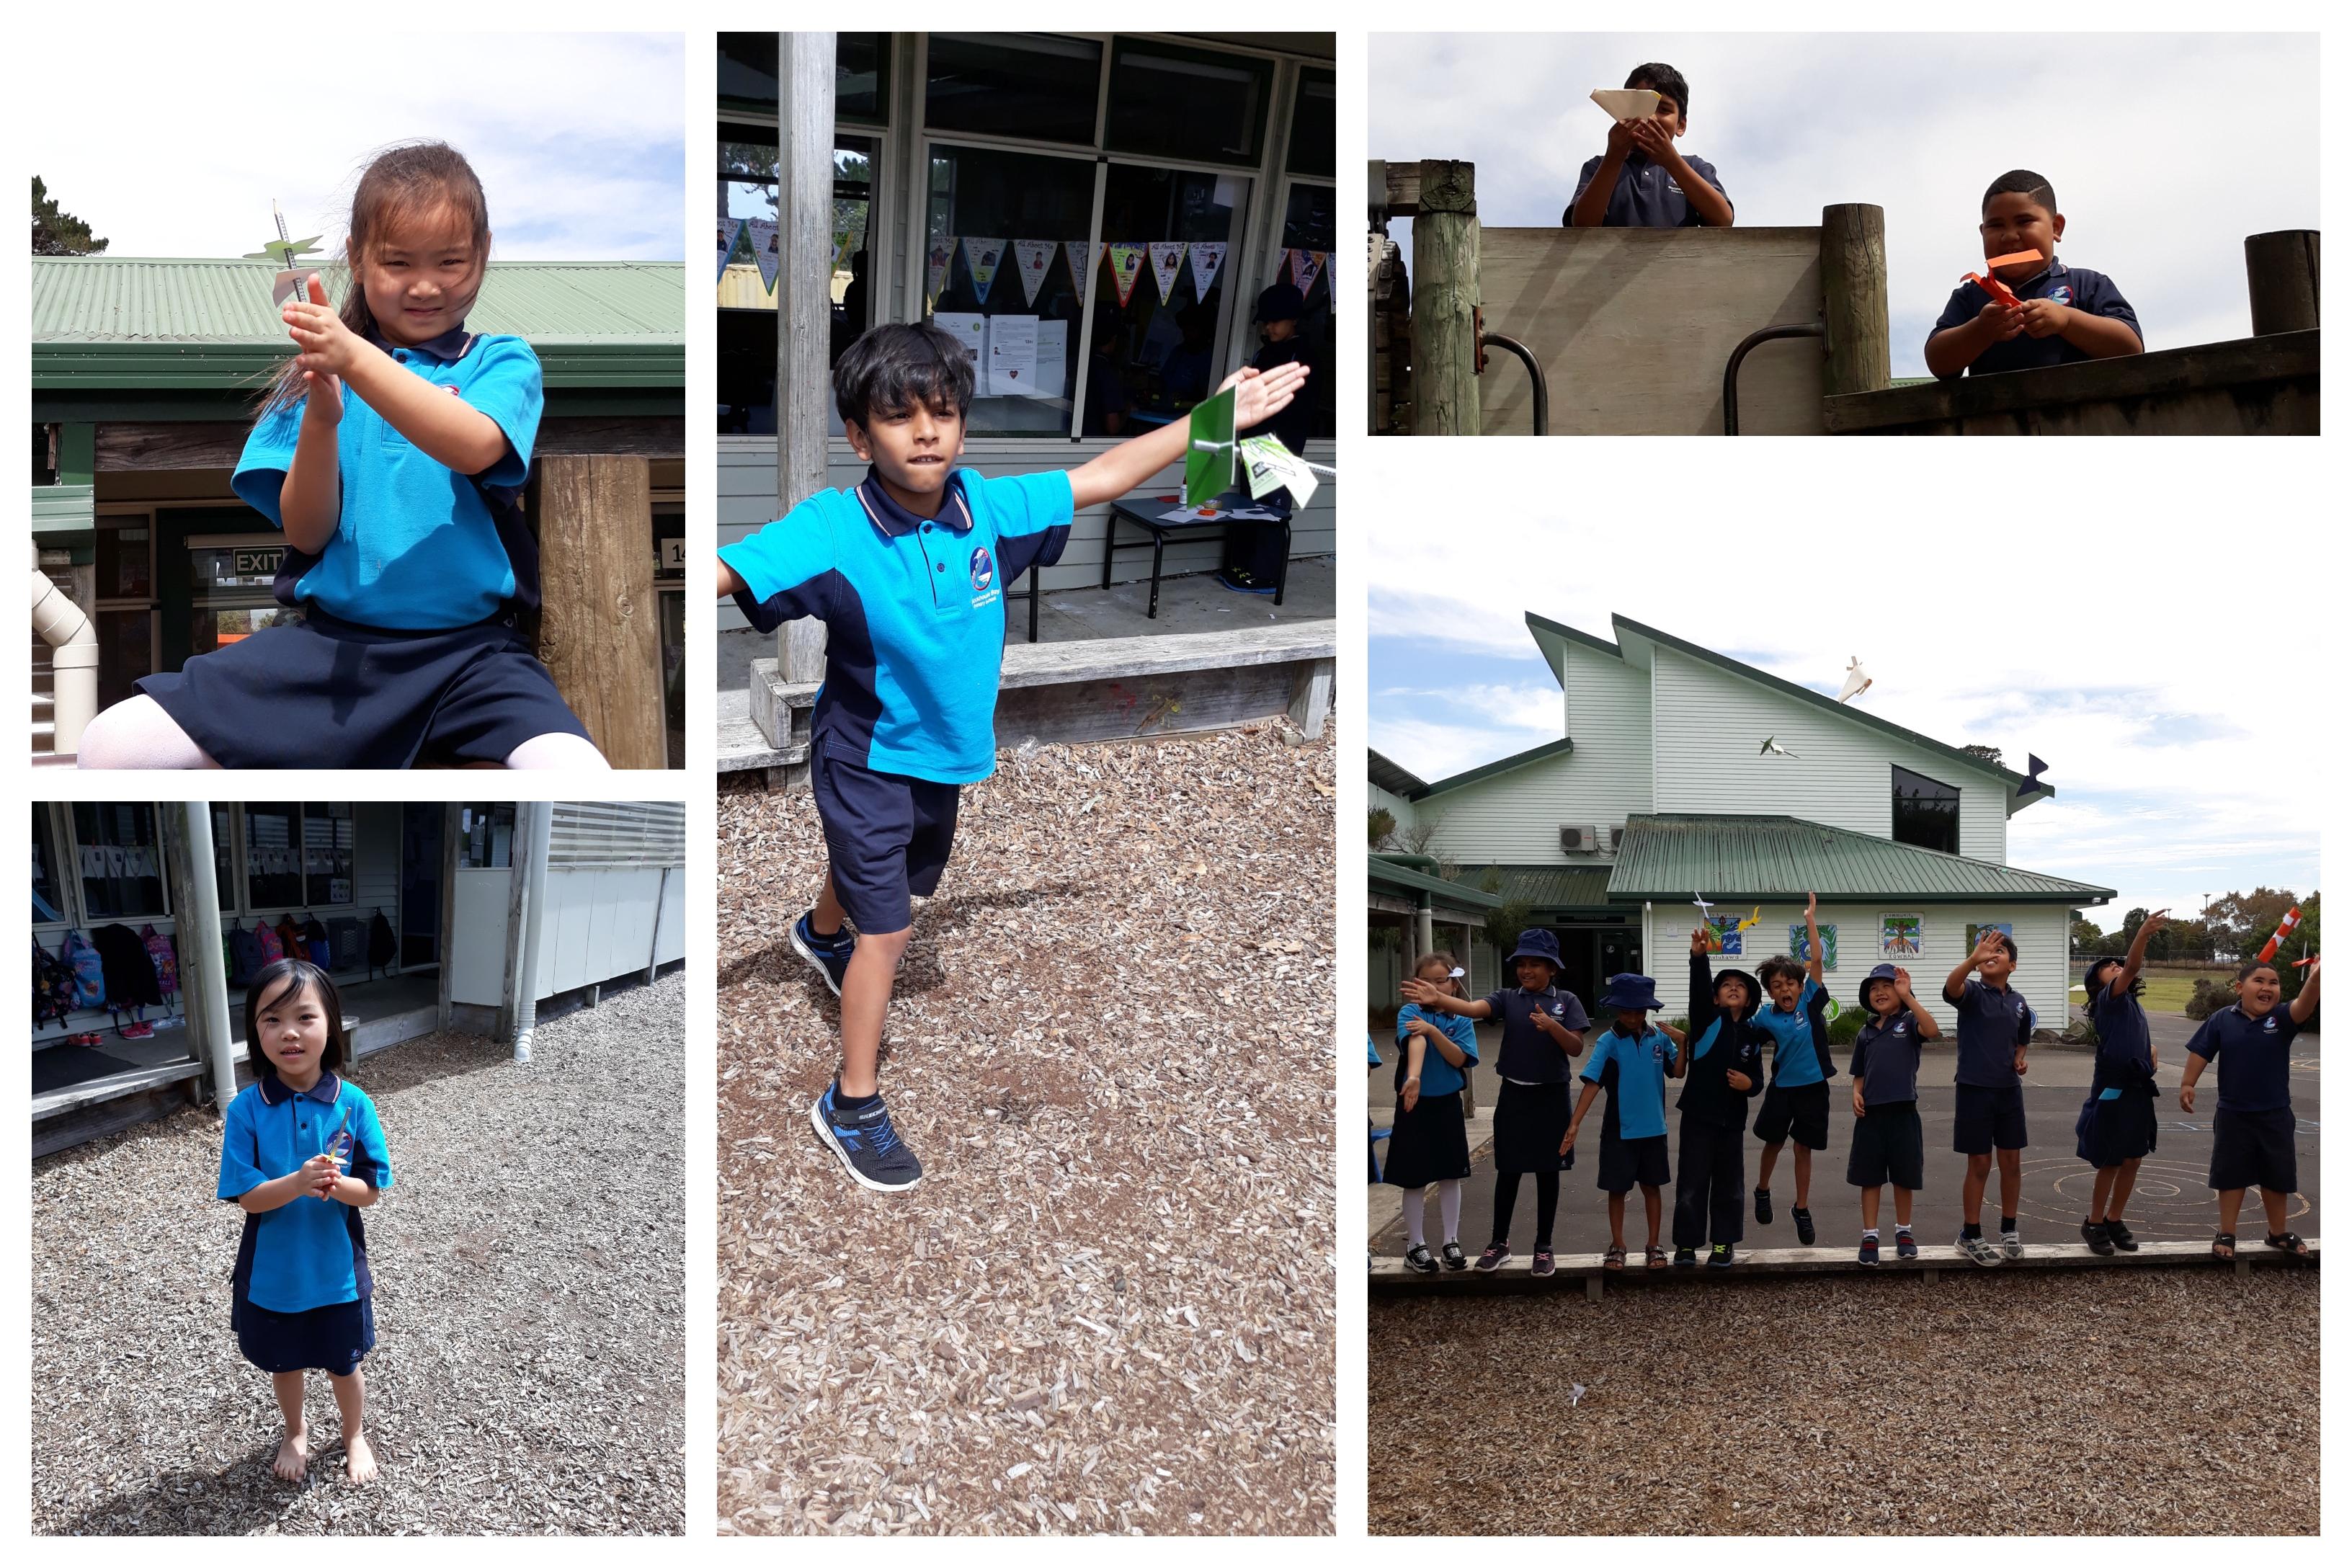 Blockhouse Bay Primary School - Rosie Revere the Engineer